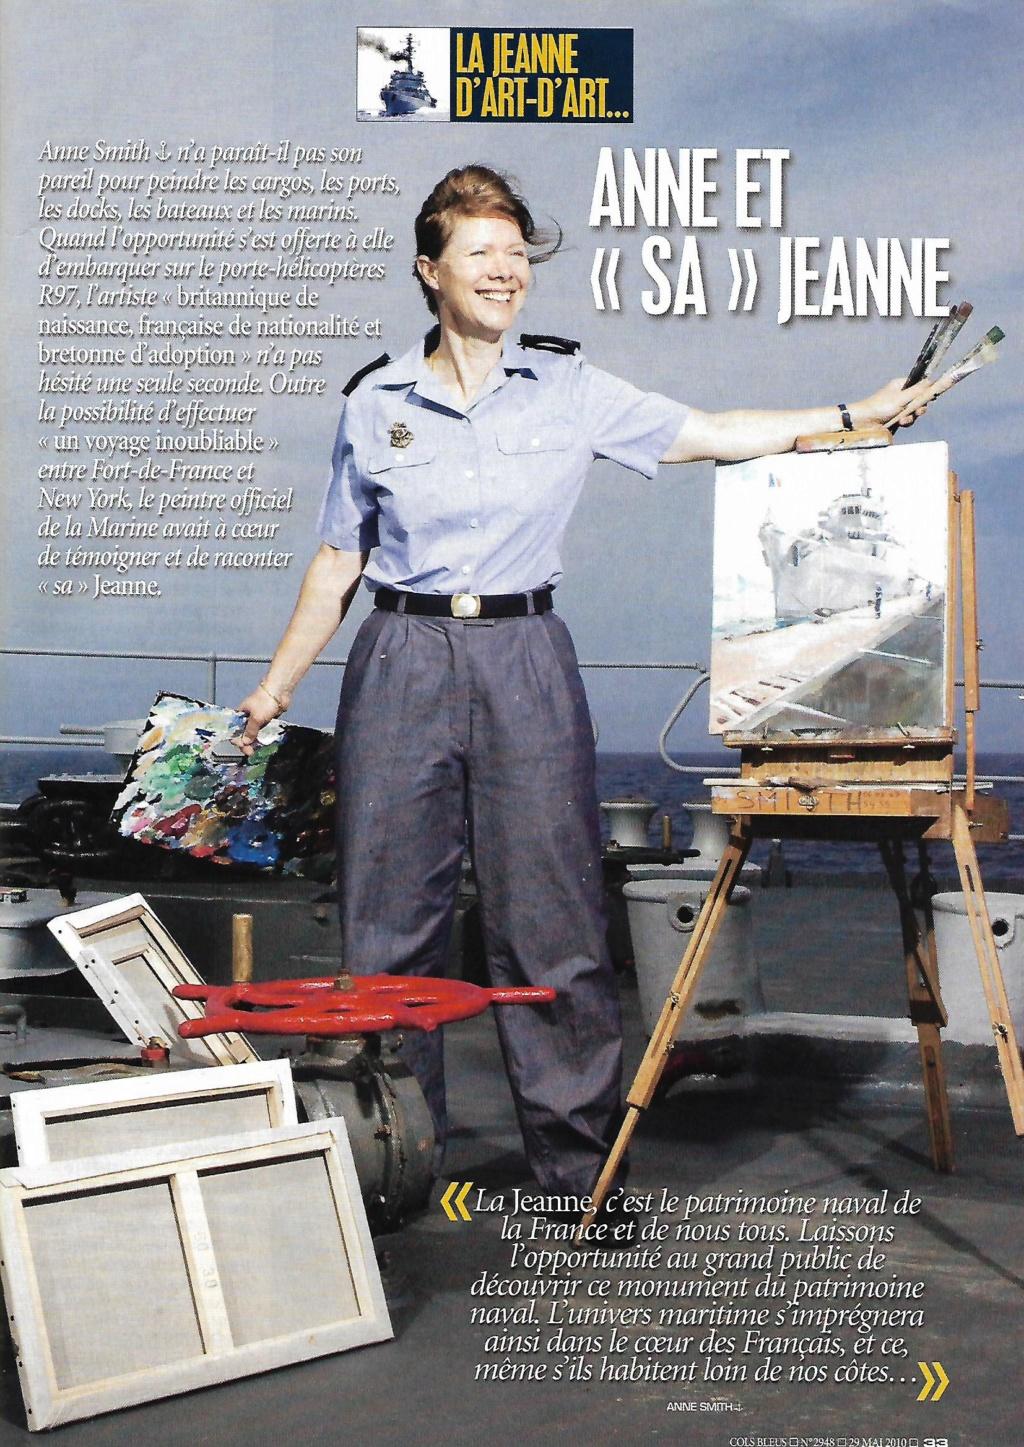 JEANNE D'ARC (PH) - VOLUME 4 - Page 22 Scan_141